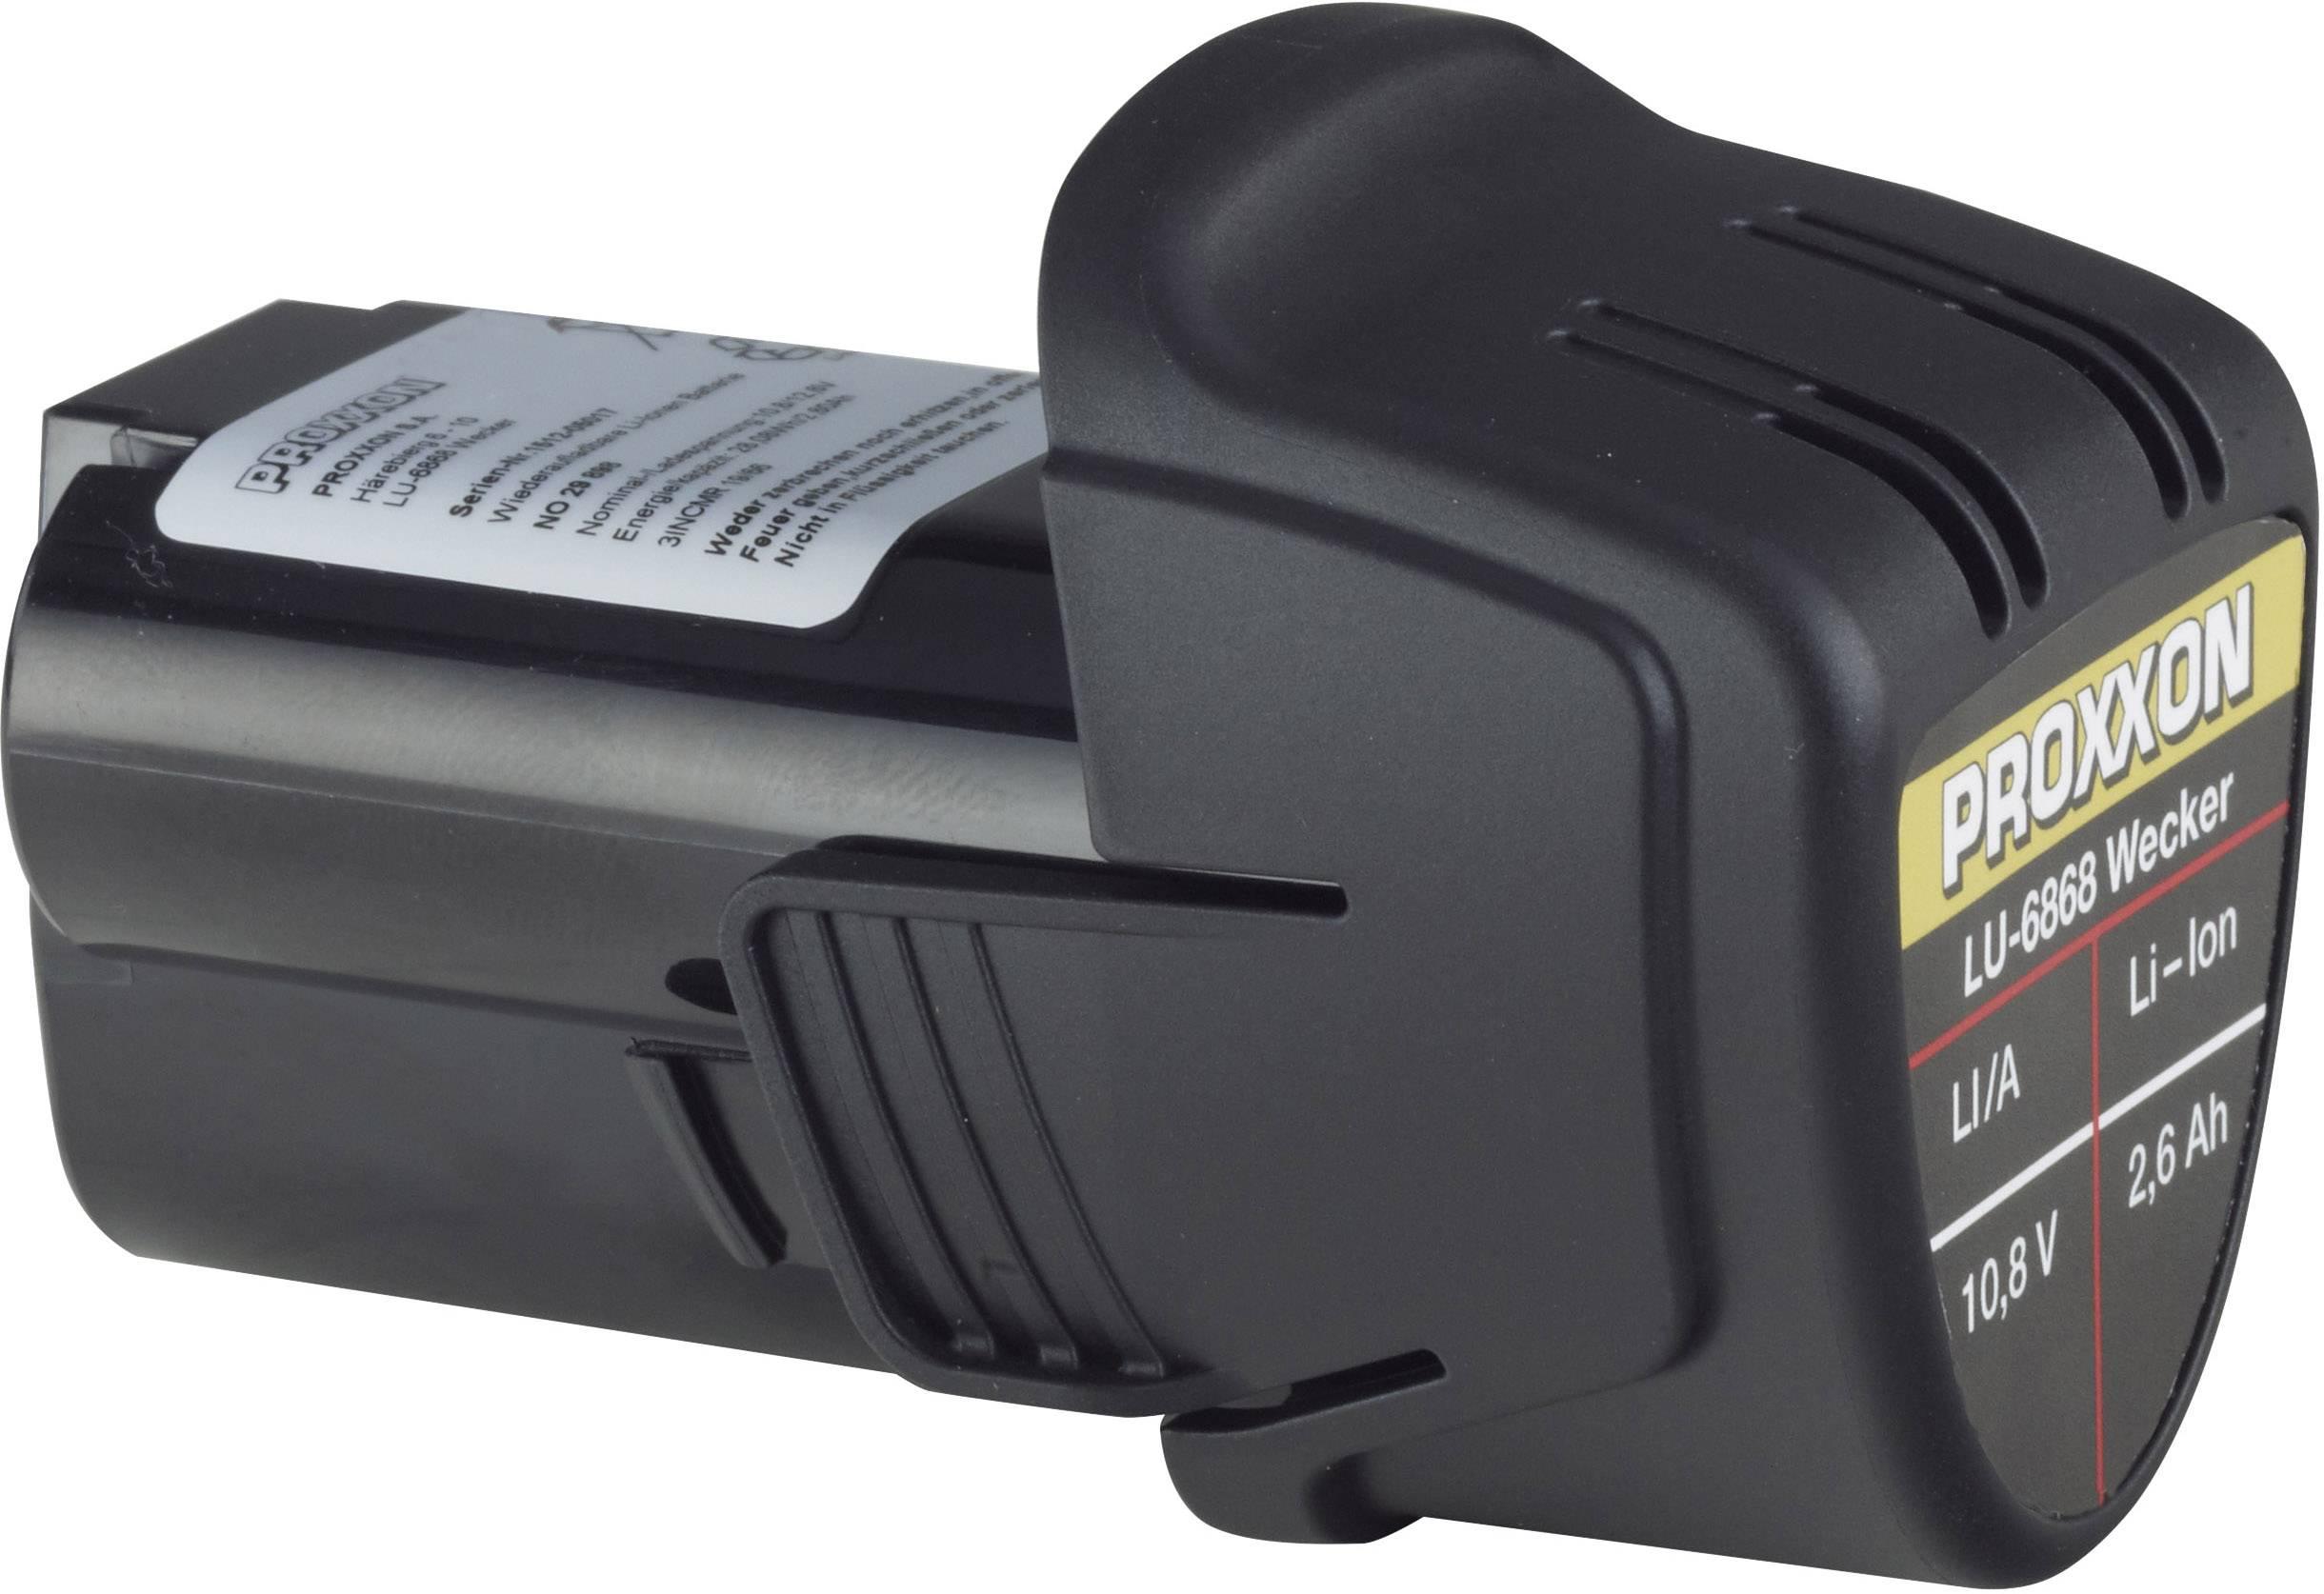 Náhradní akumulátor pro elektrické nářadí, Proxxon Micromot Li/A 29898, 10.8 V, 2.6 Ah, Li-Ion akumulátor